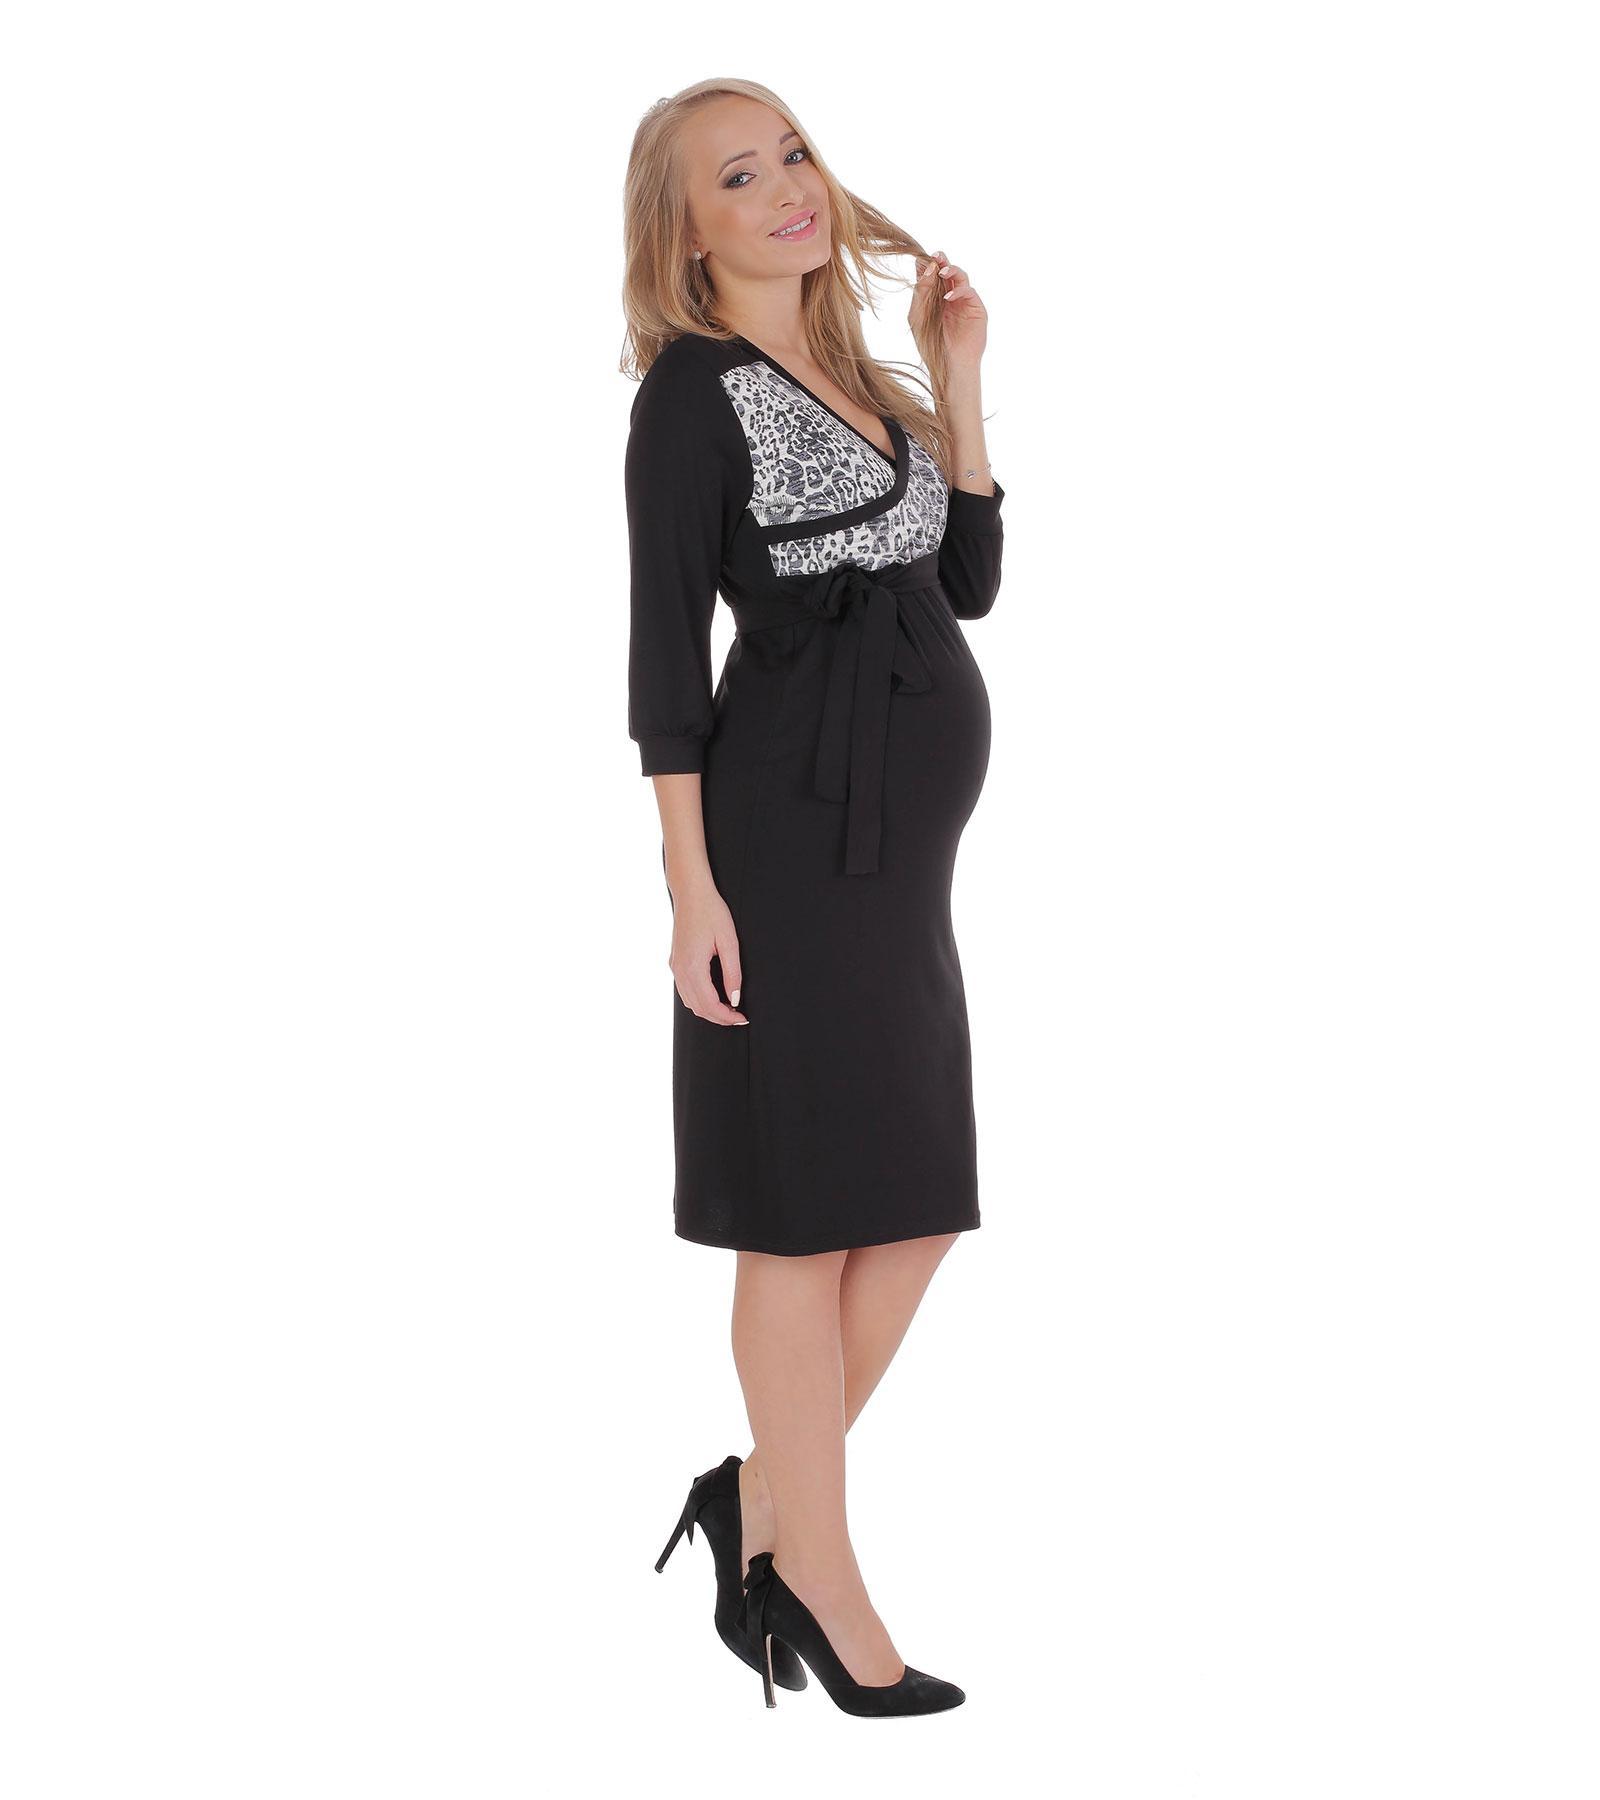 Czarna sukienka ciążowa Chanel Black Bensini®